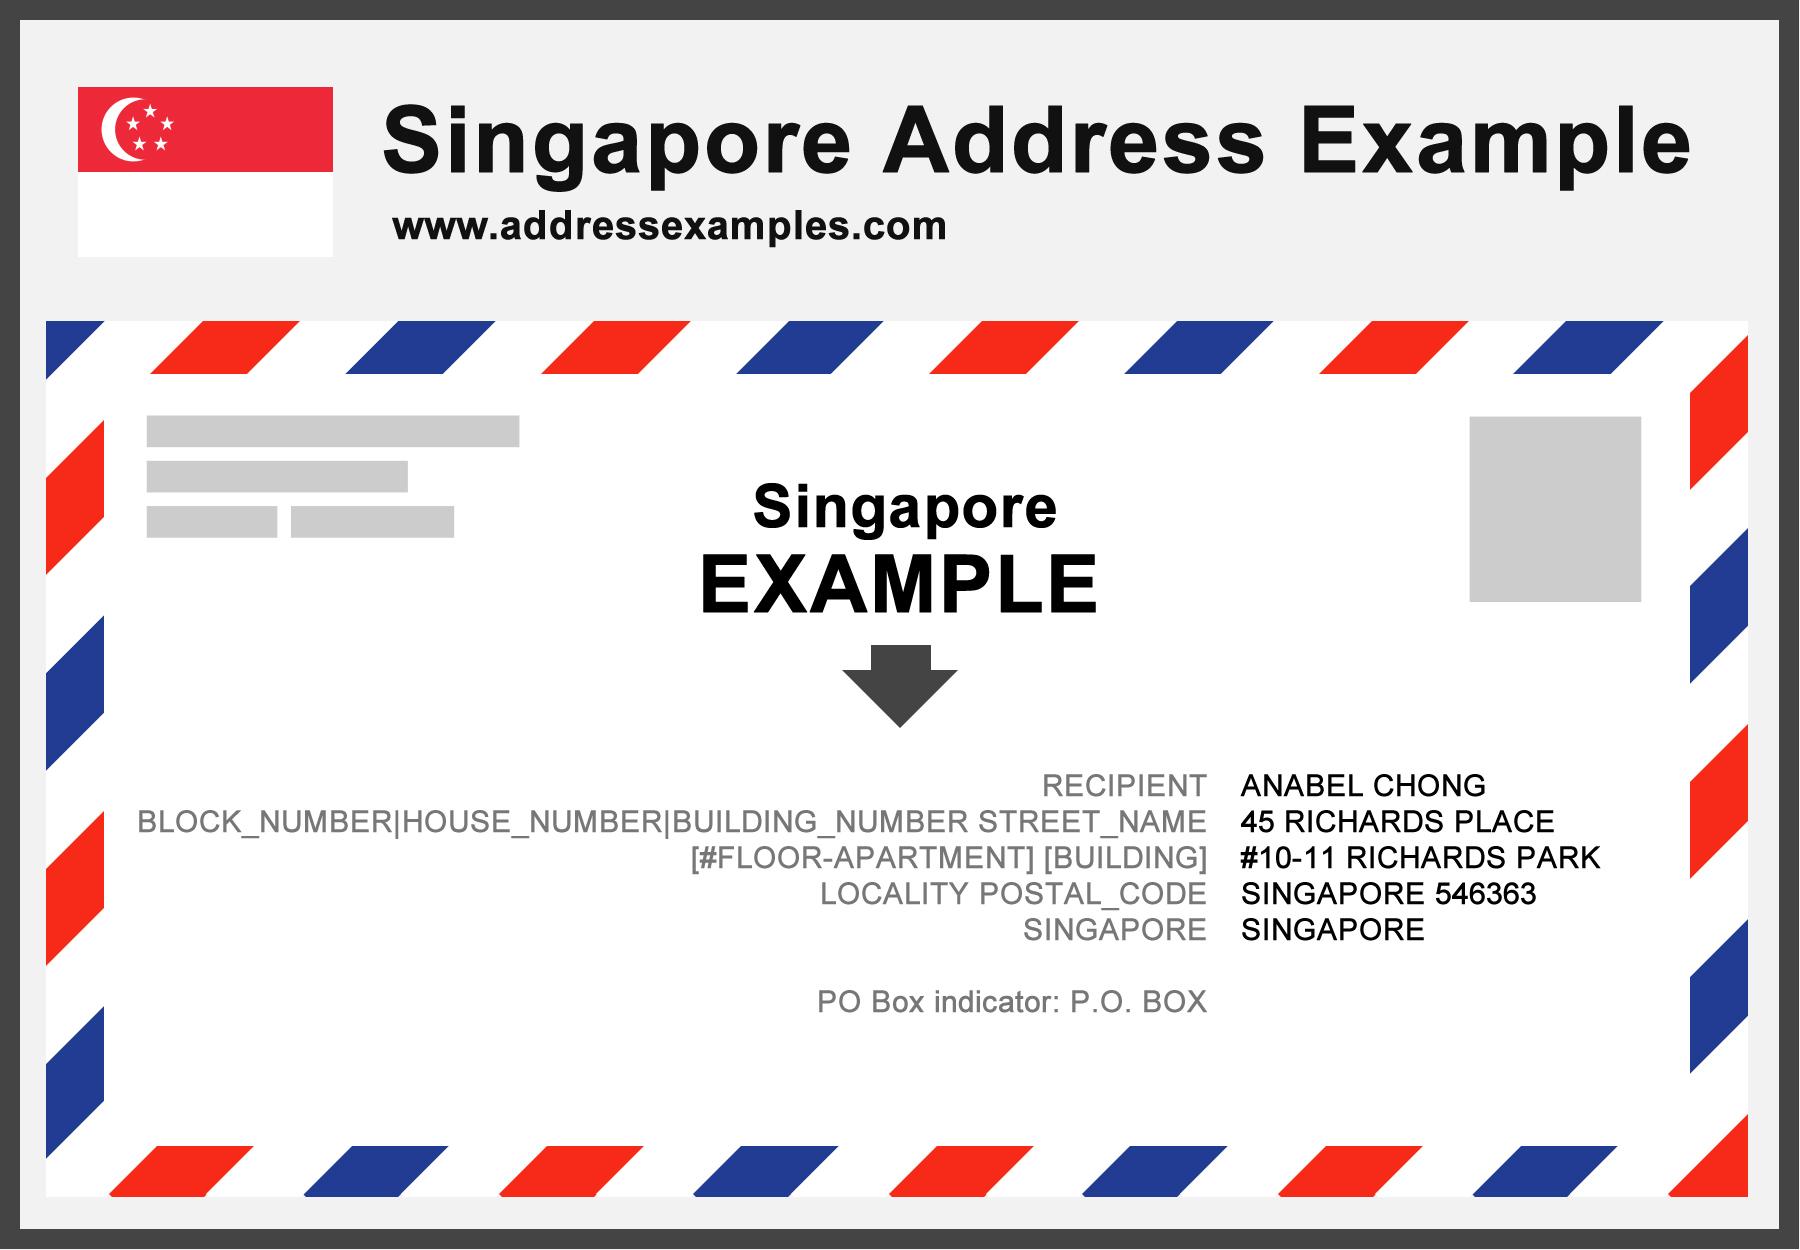 Singapore Address Example